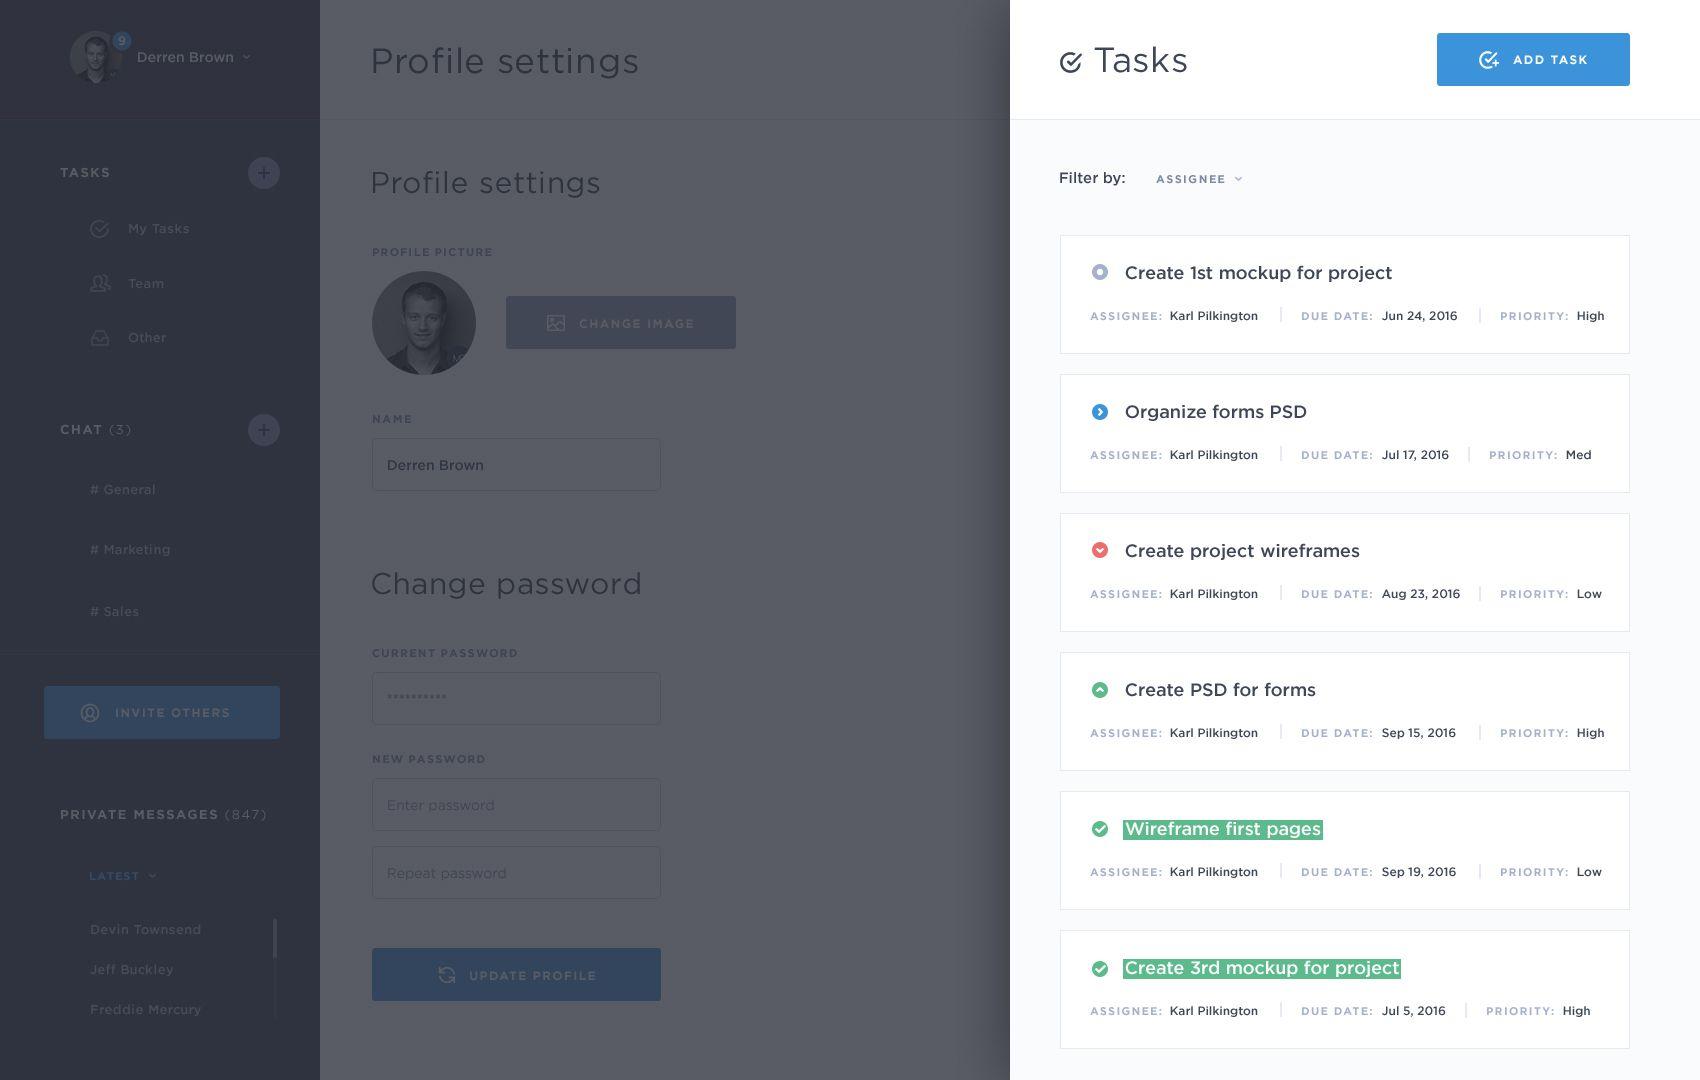 5. doiq   my tasks  profile settings page